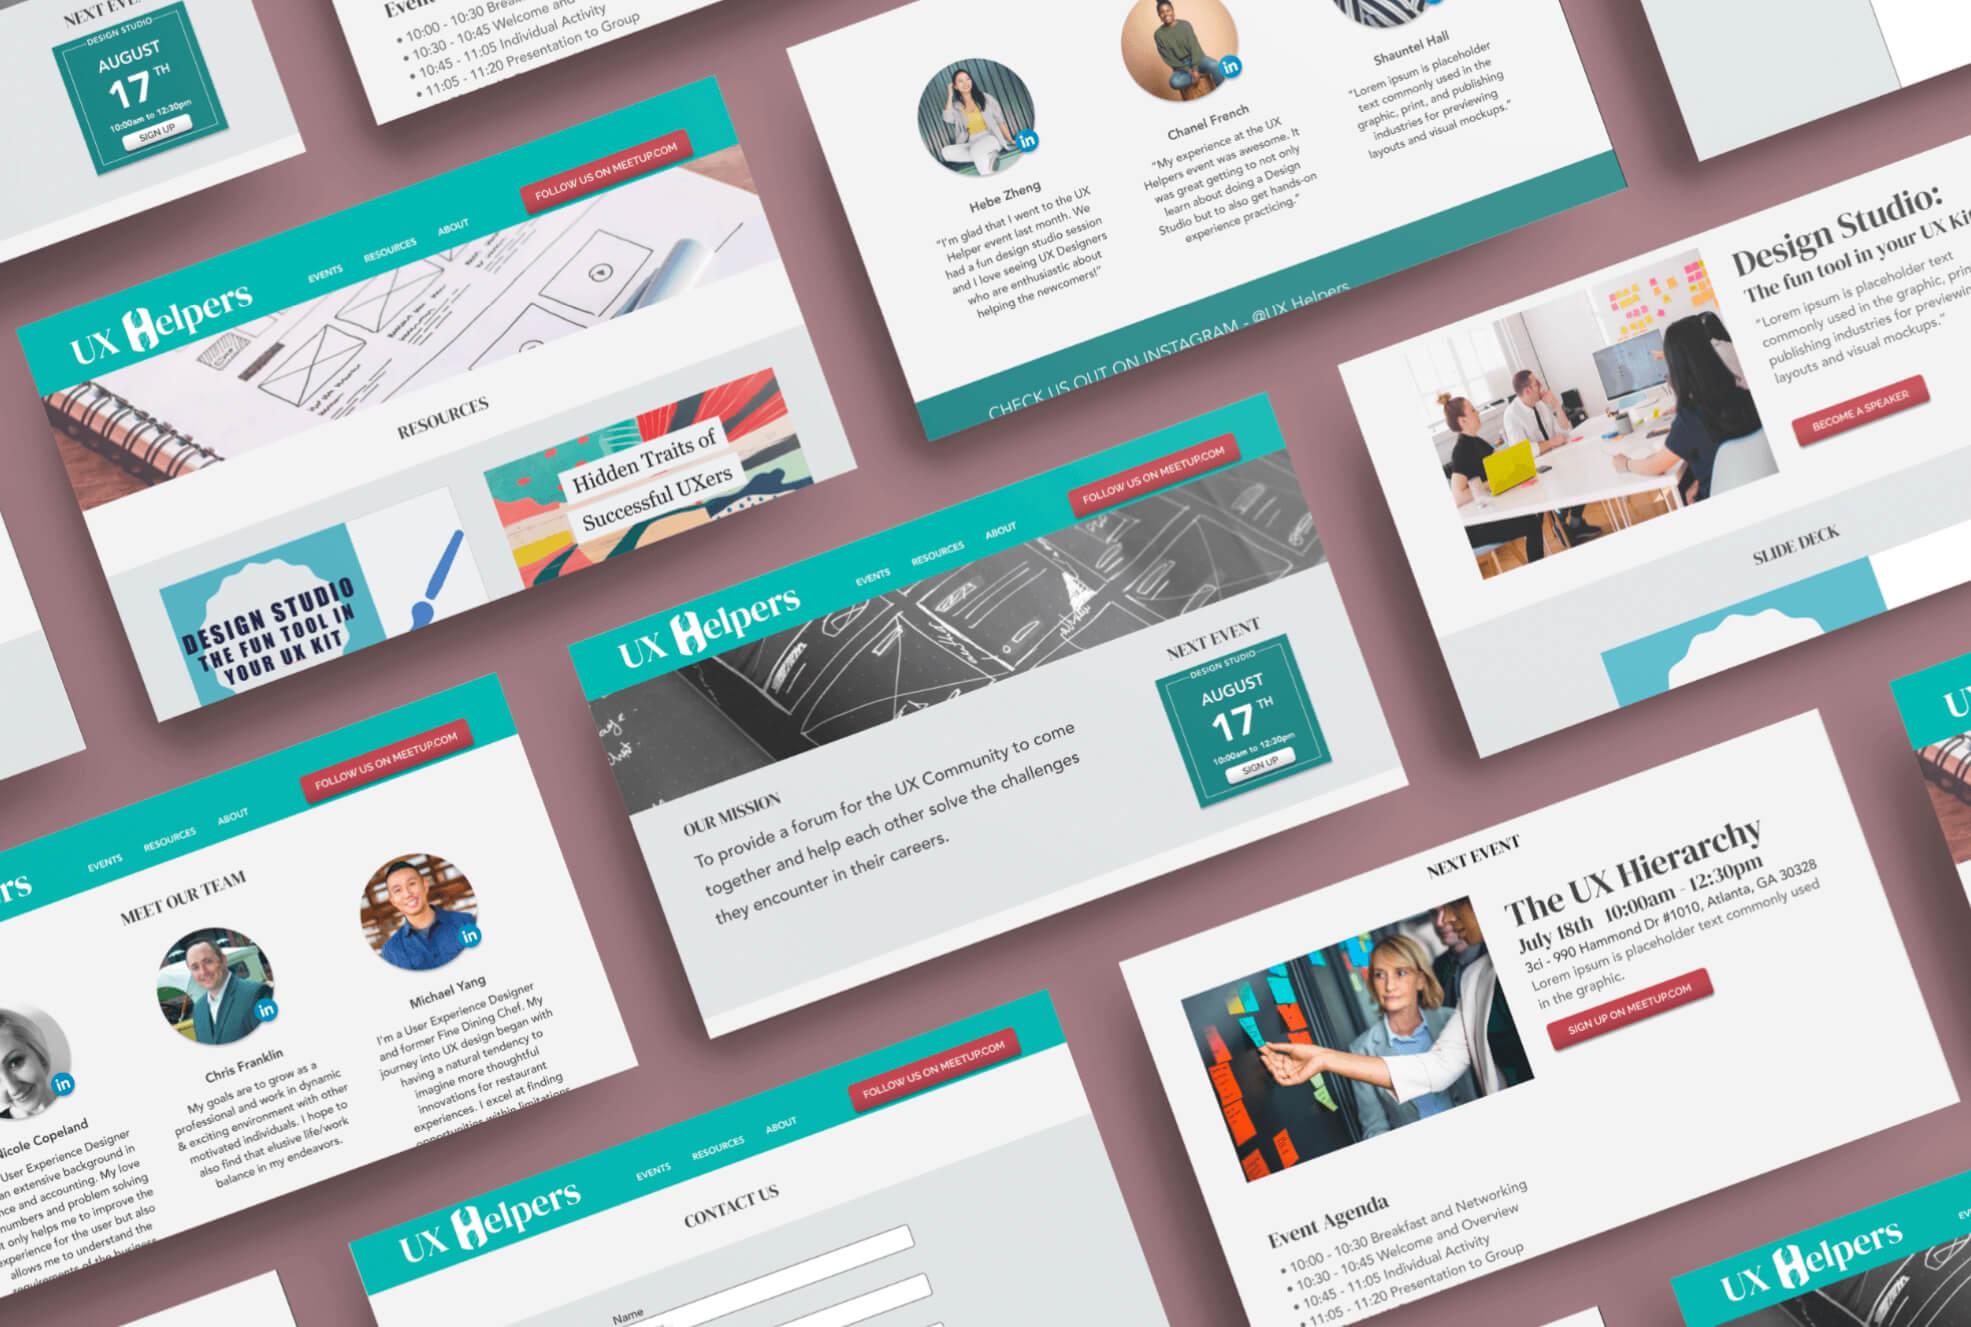 UX Helpers website collage